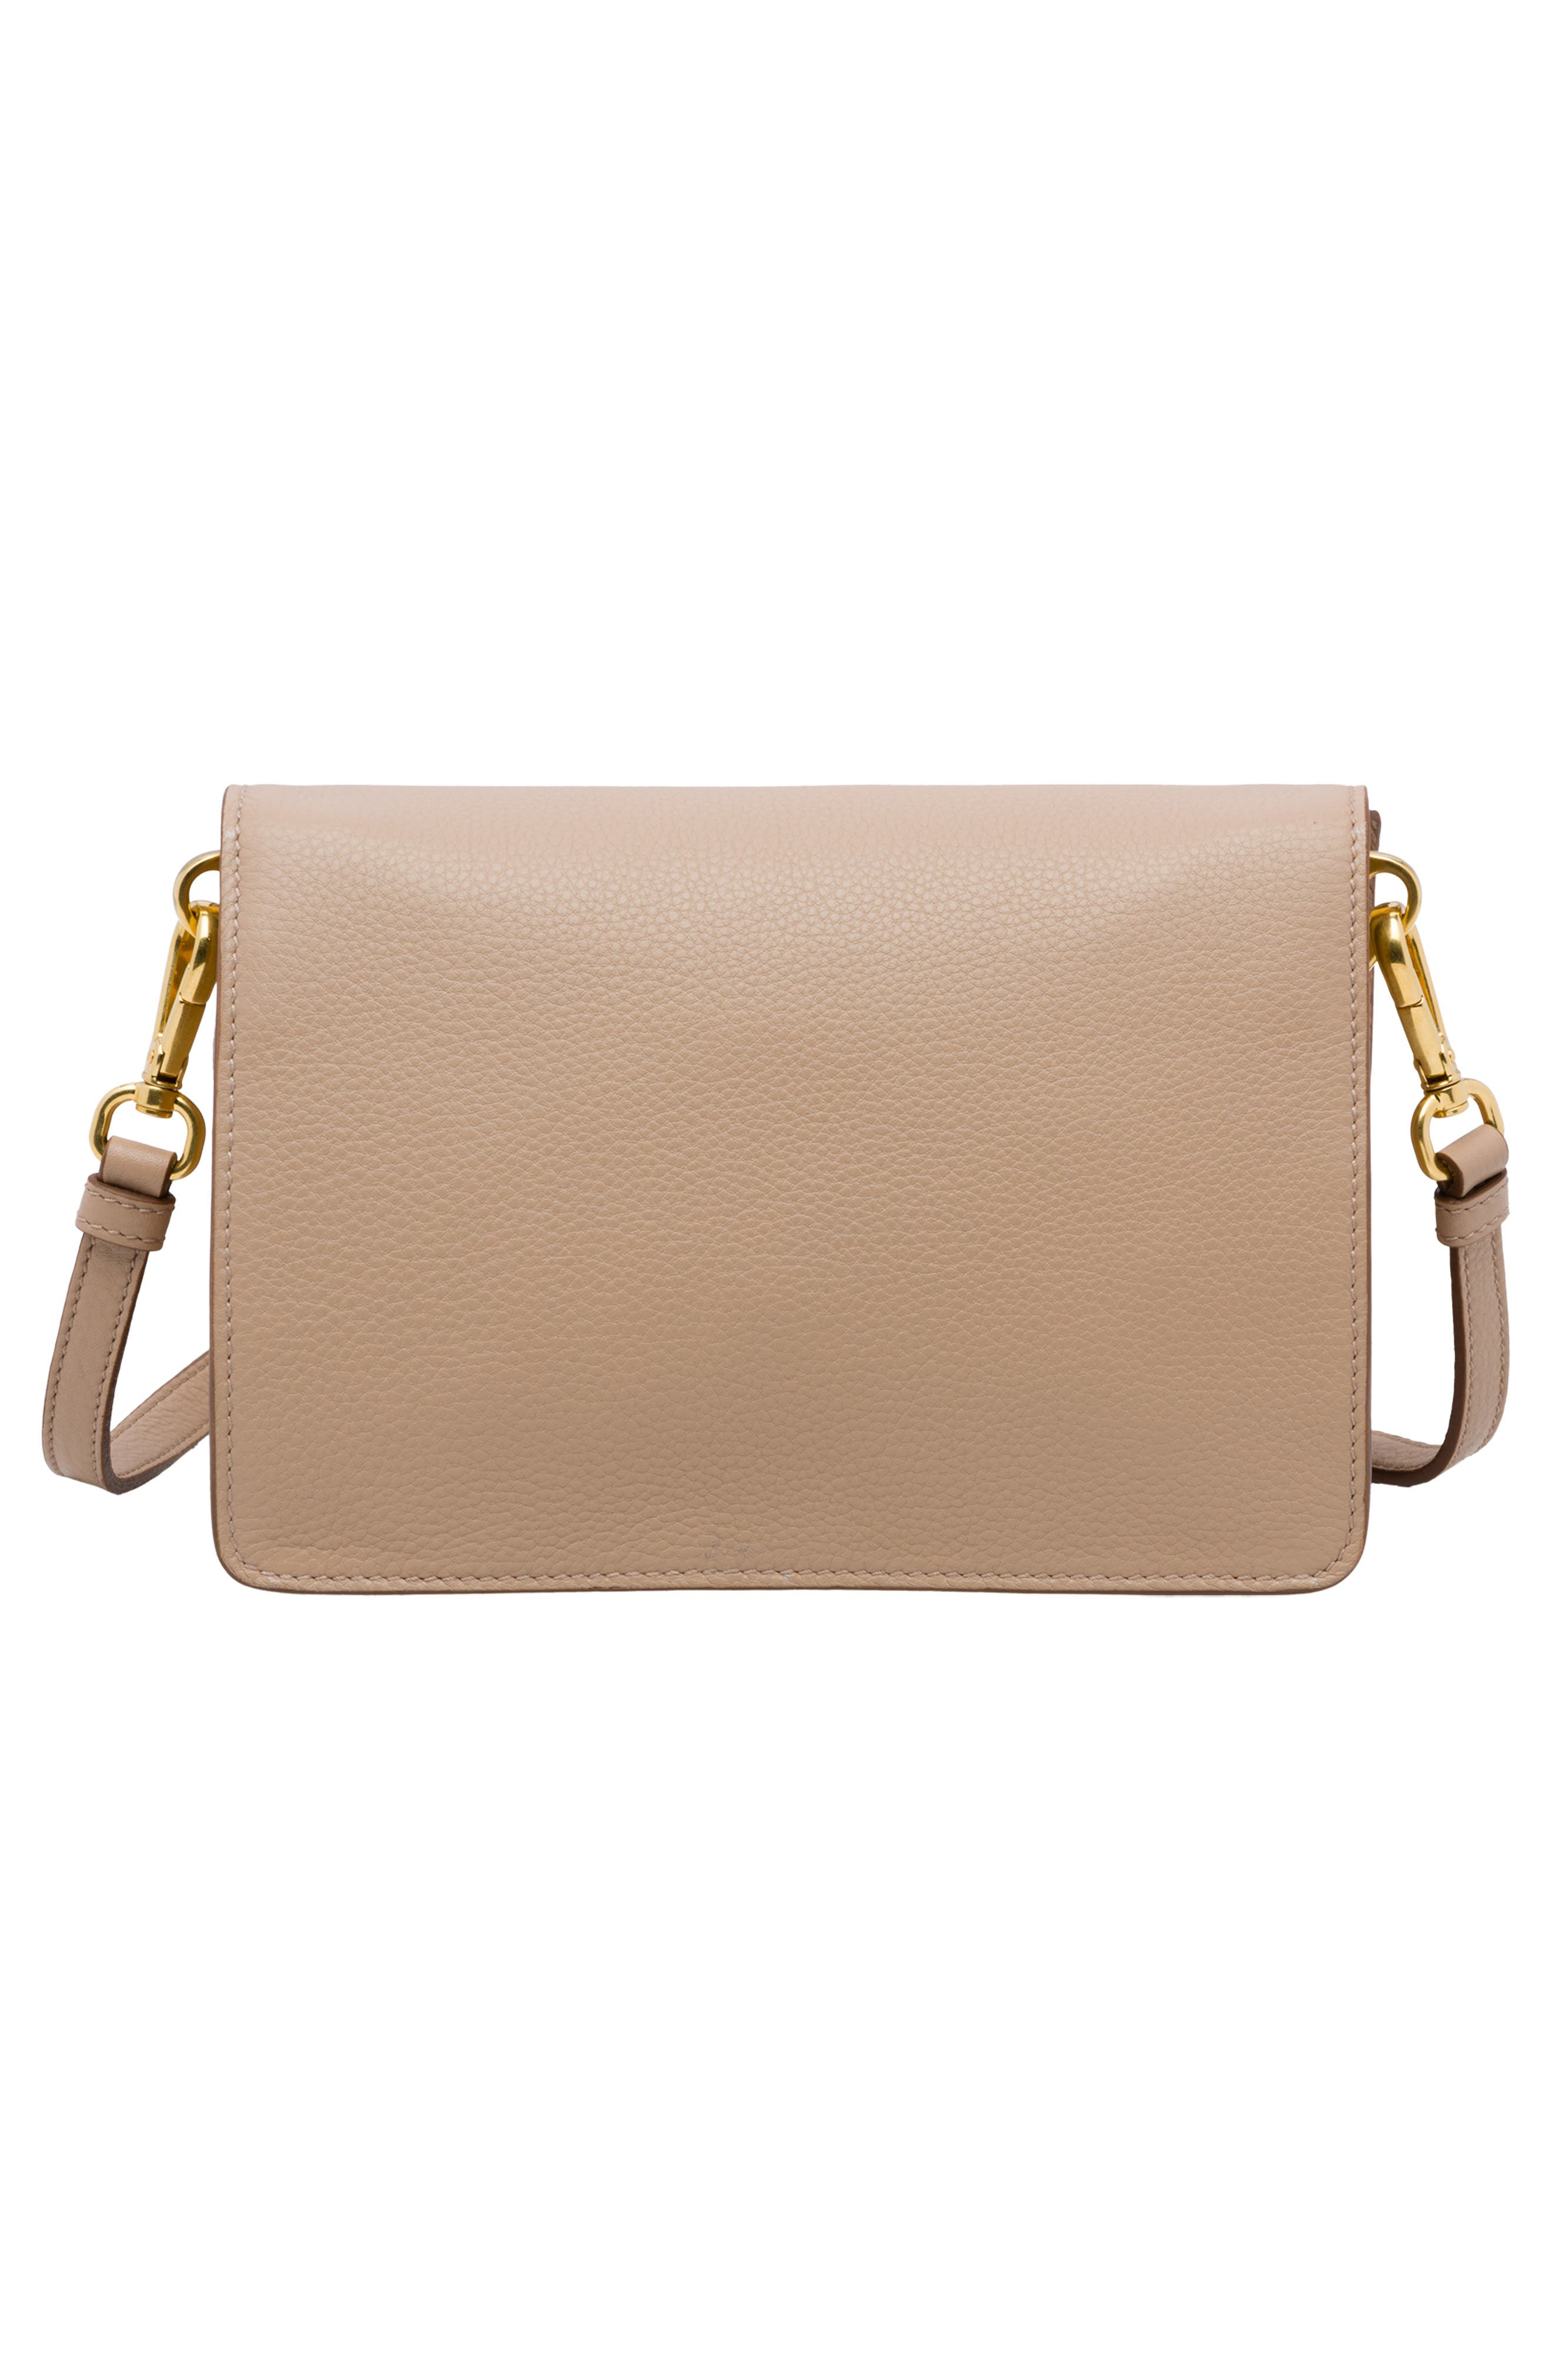 PRADA, Vitello Daino Double Compartment Leather Shoulder Bag, Alternate thumbnail 3, color, CAMMEO